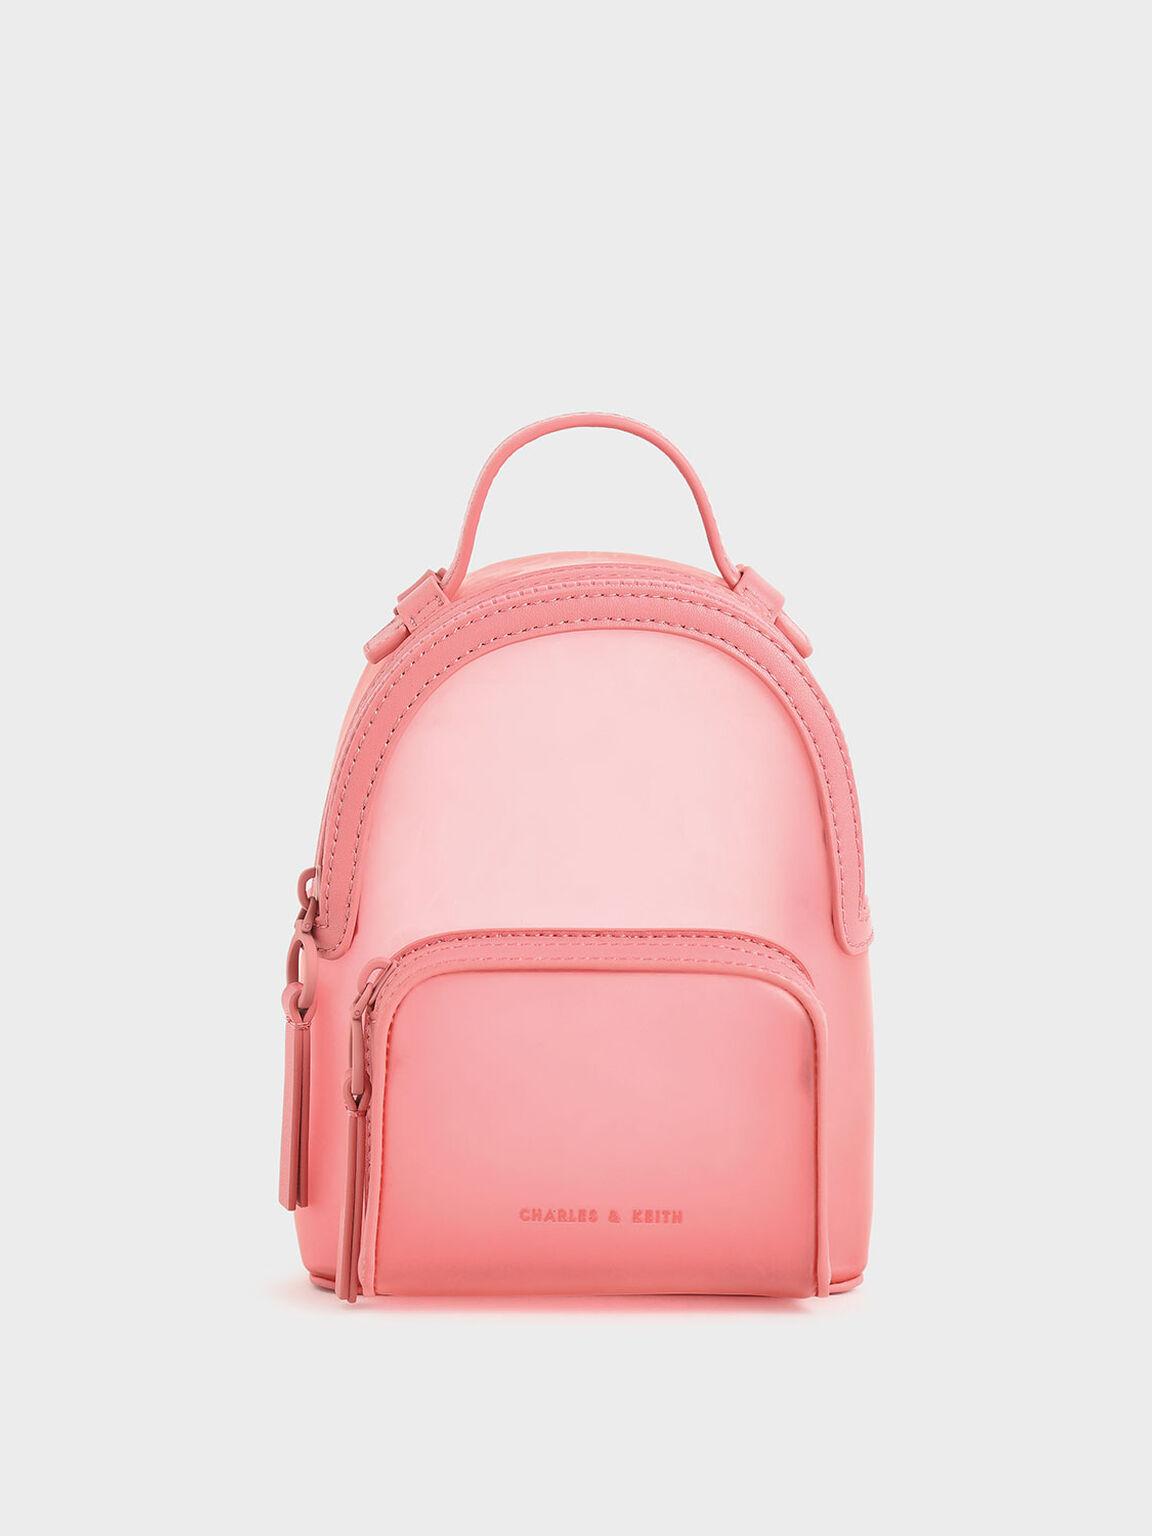 See-Through Backpack, Pink, hi-res